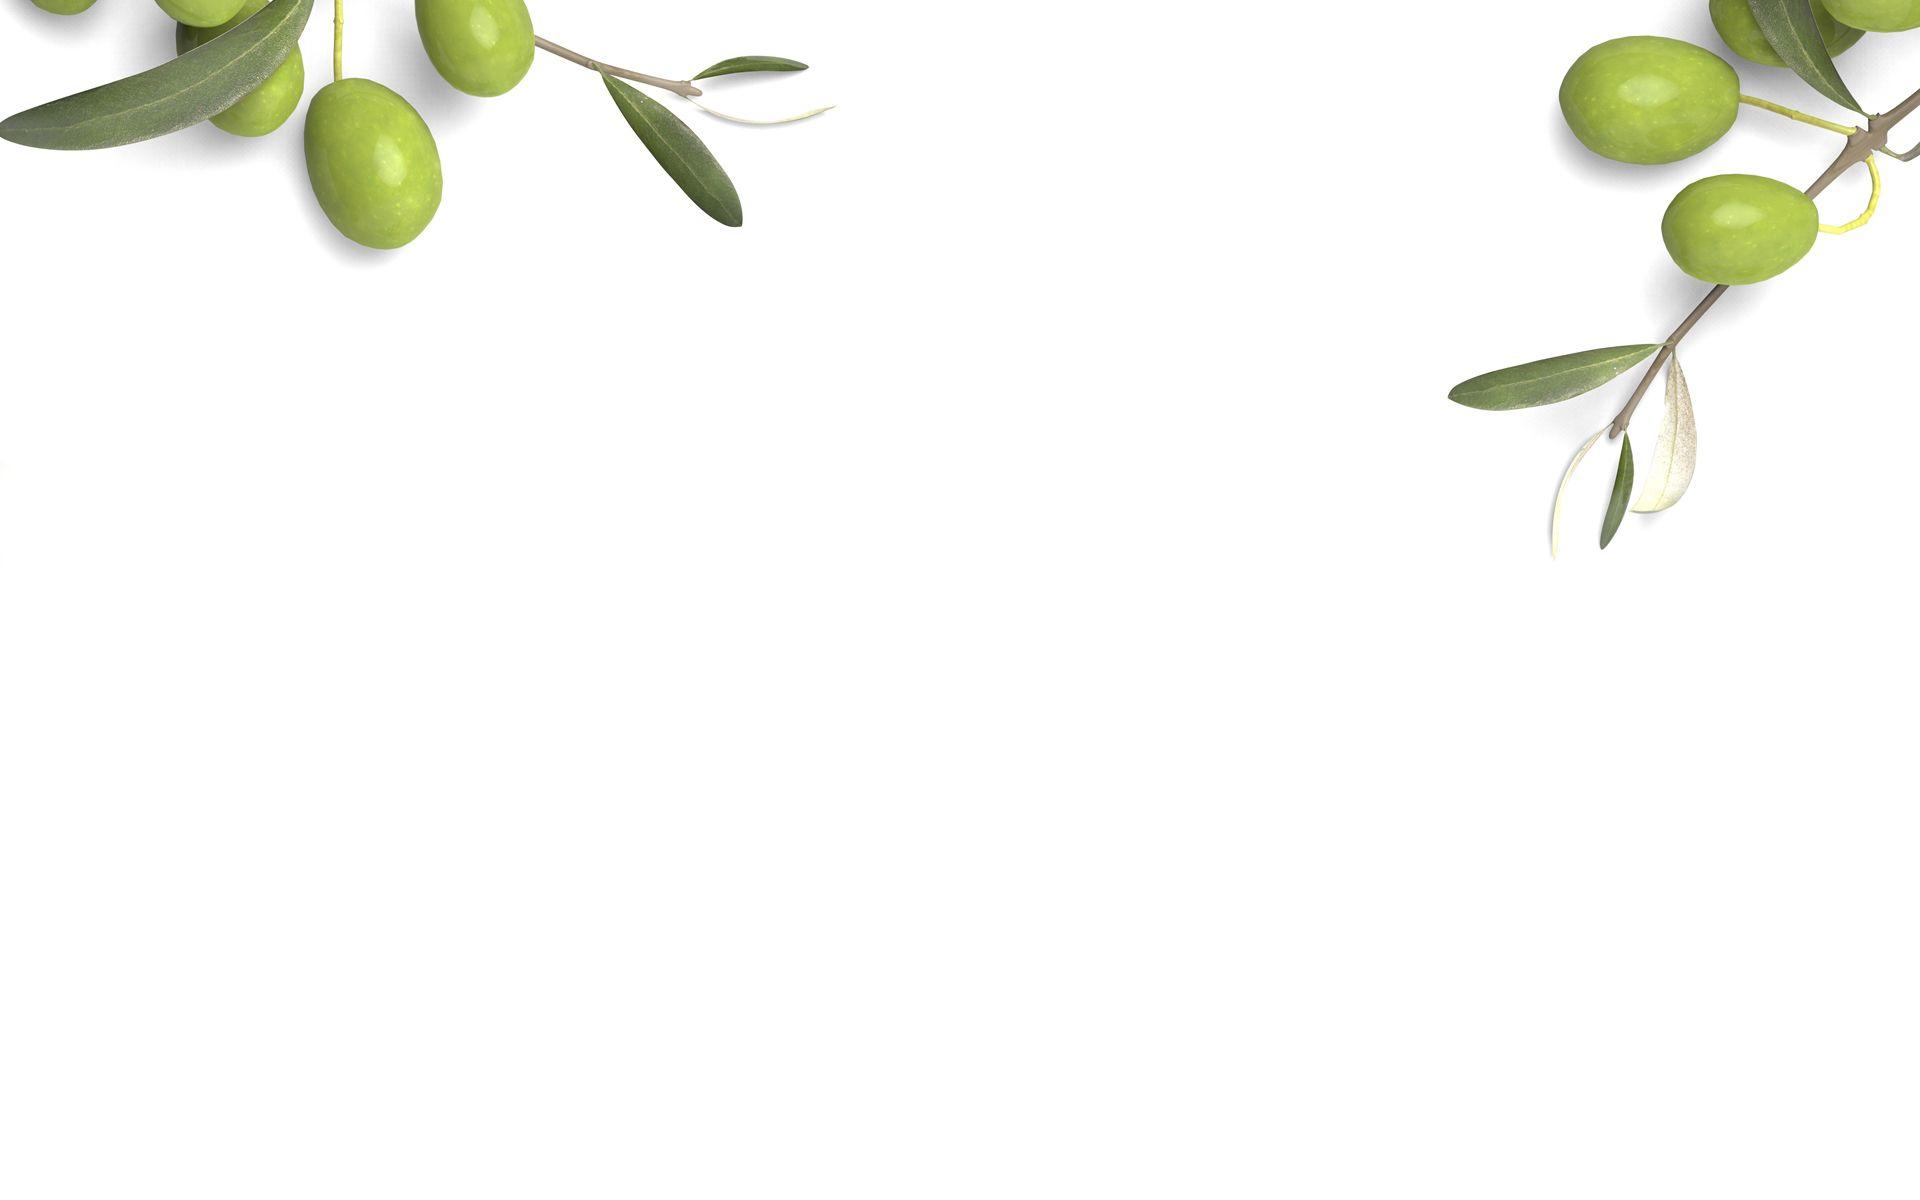 Kalamazoo Olive Company